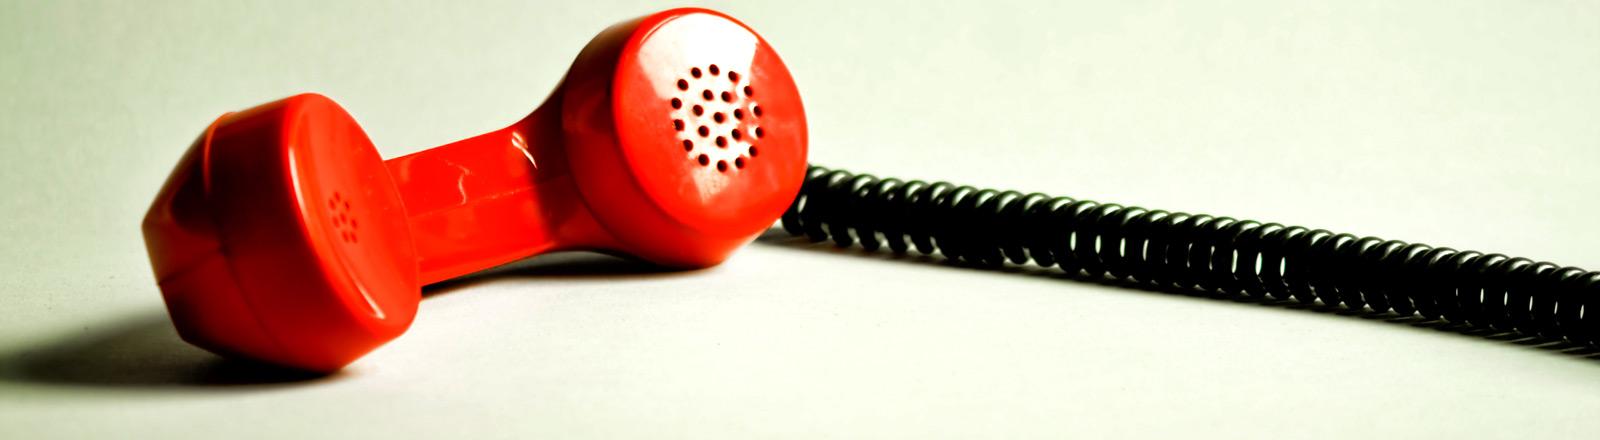 Ein roter Telefonhörer.